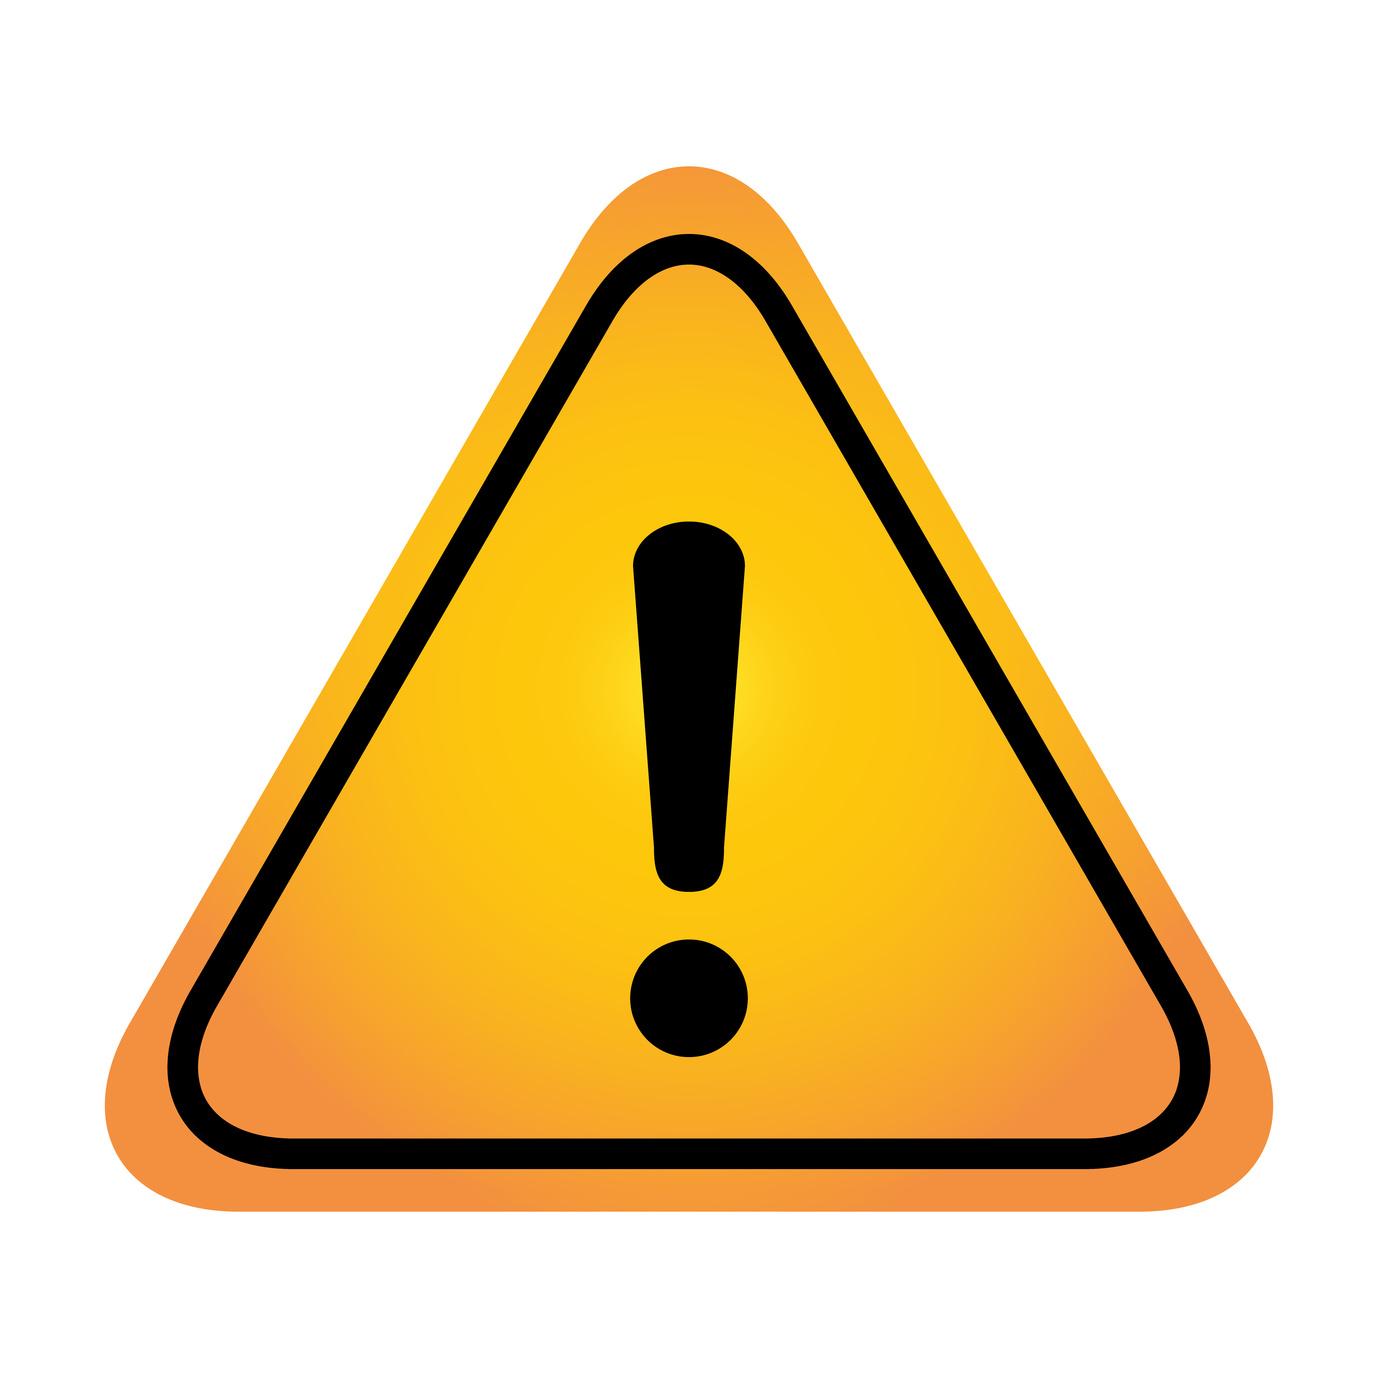 Caution repair or replace moisture meter